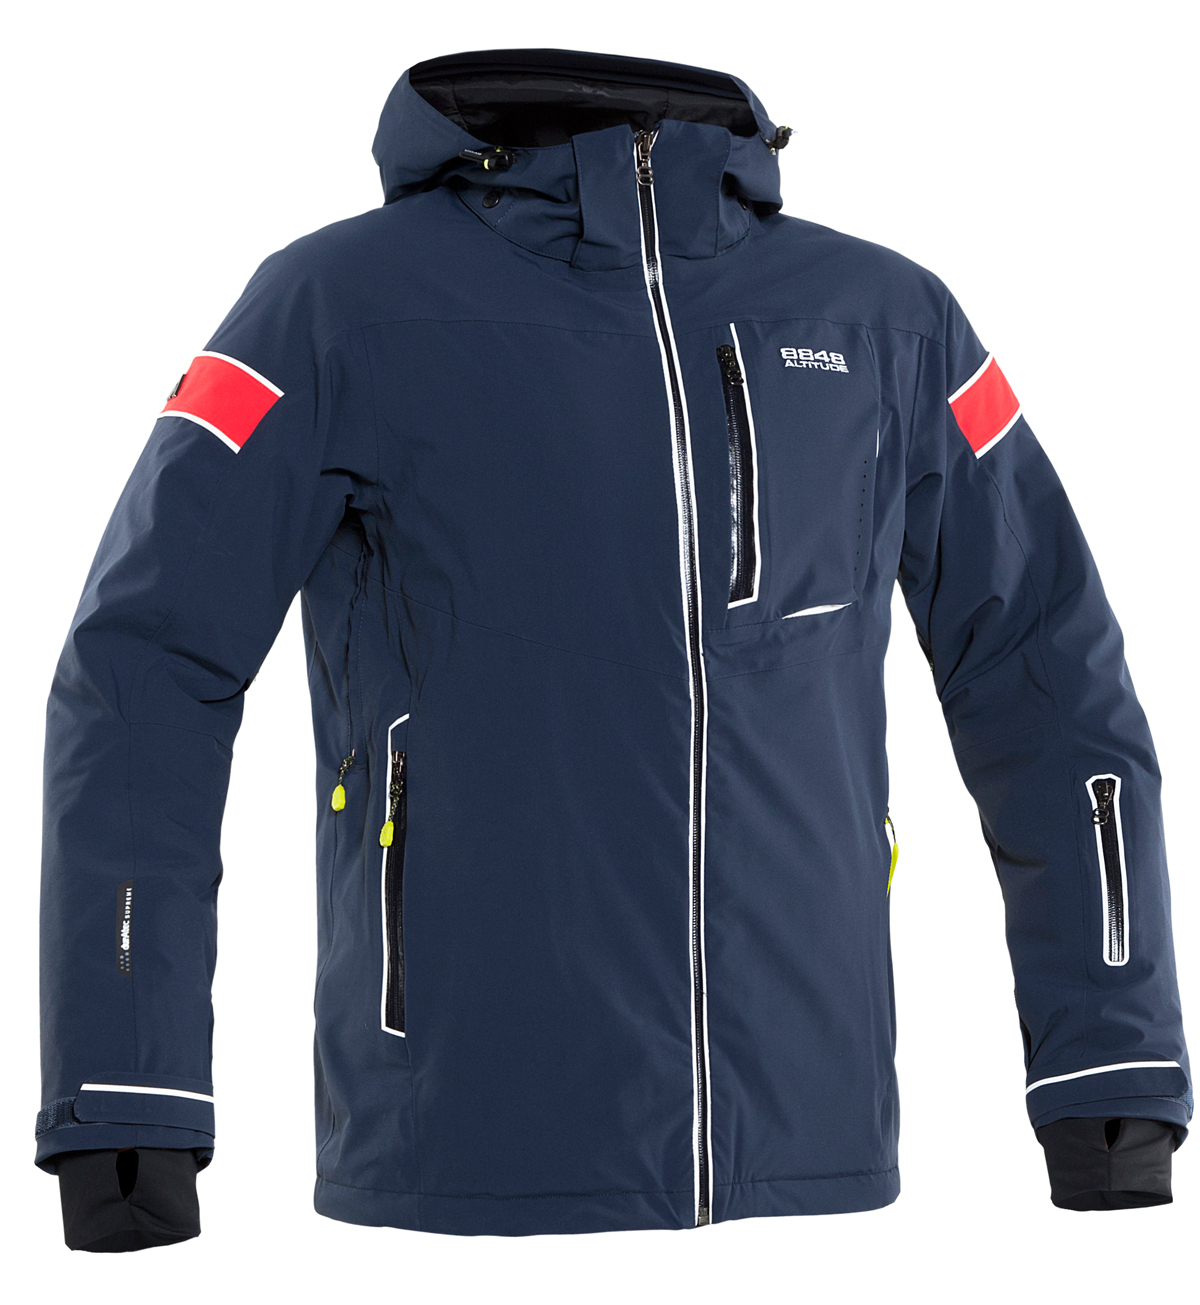 Куртка горнолыжная 8848 Altitude Switch 2 Navy мужская